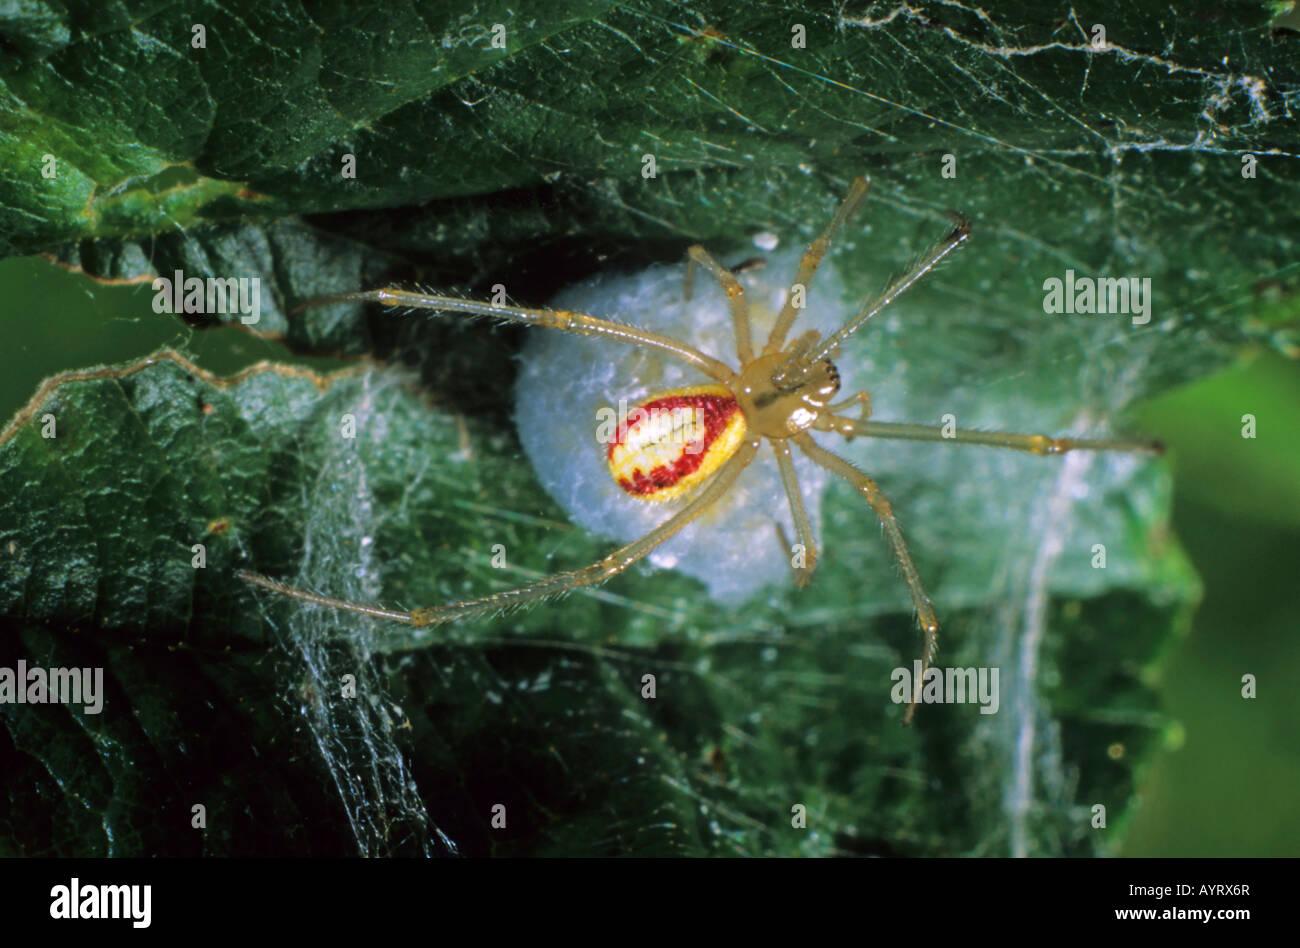 Cobweb Spider (Enoplognatha lineata) and egg cocoon - Stock Image